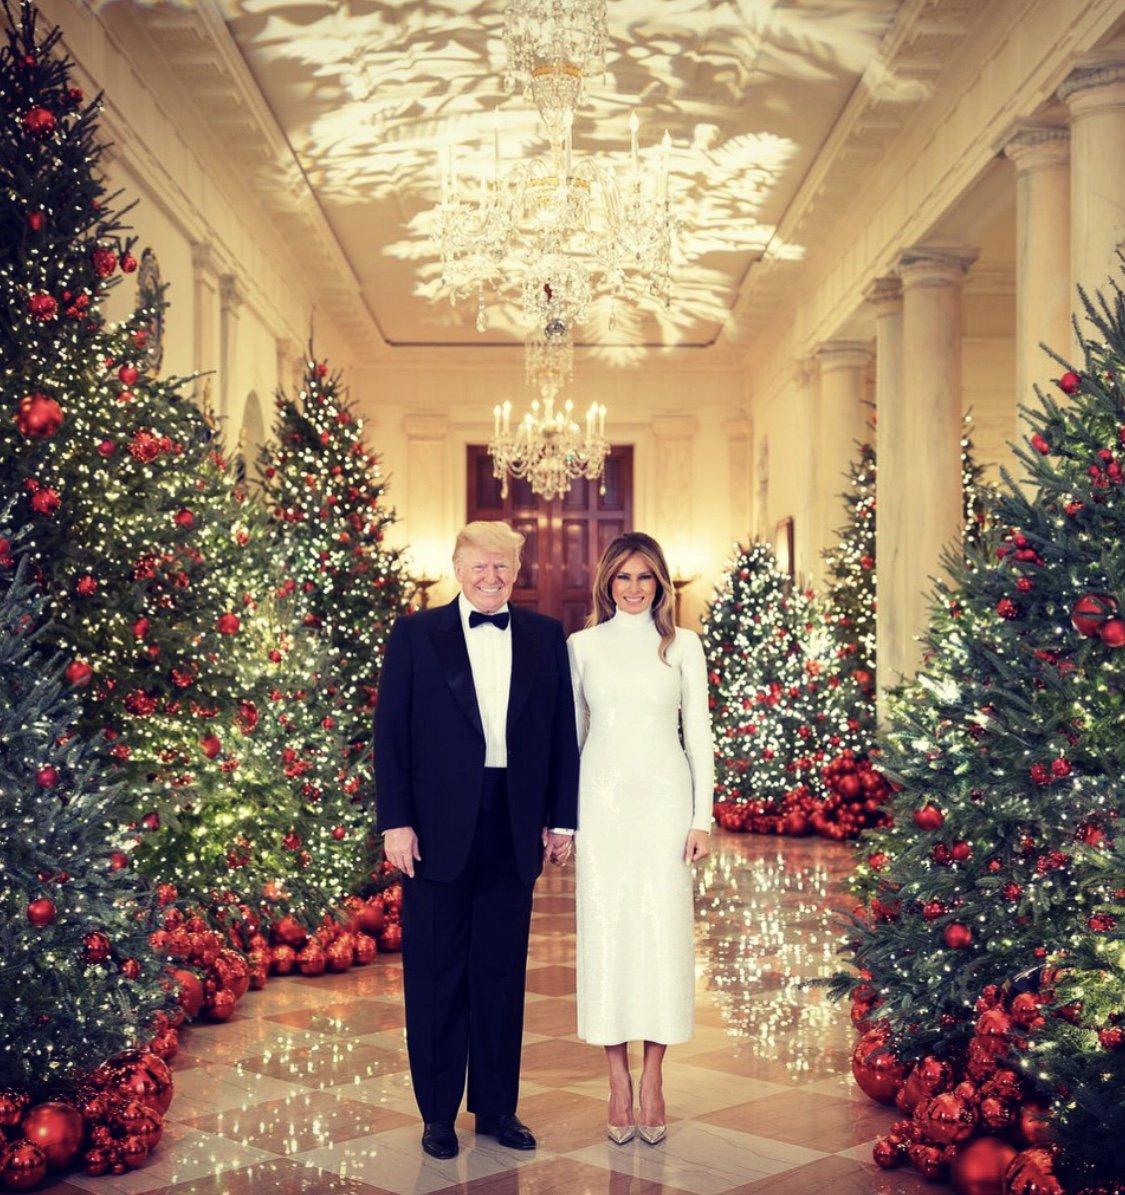 Melania Trump On Twitter Merry Christmas From President Donald J